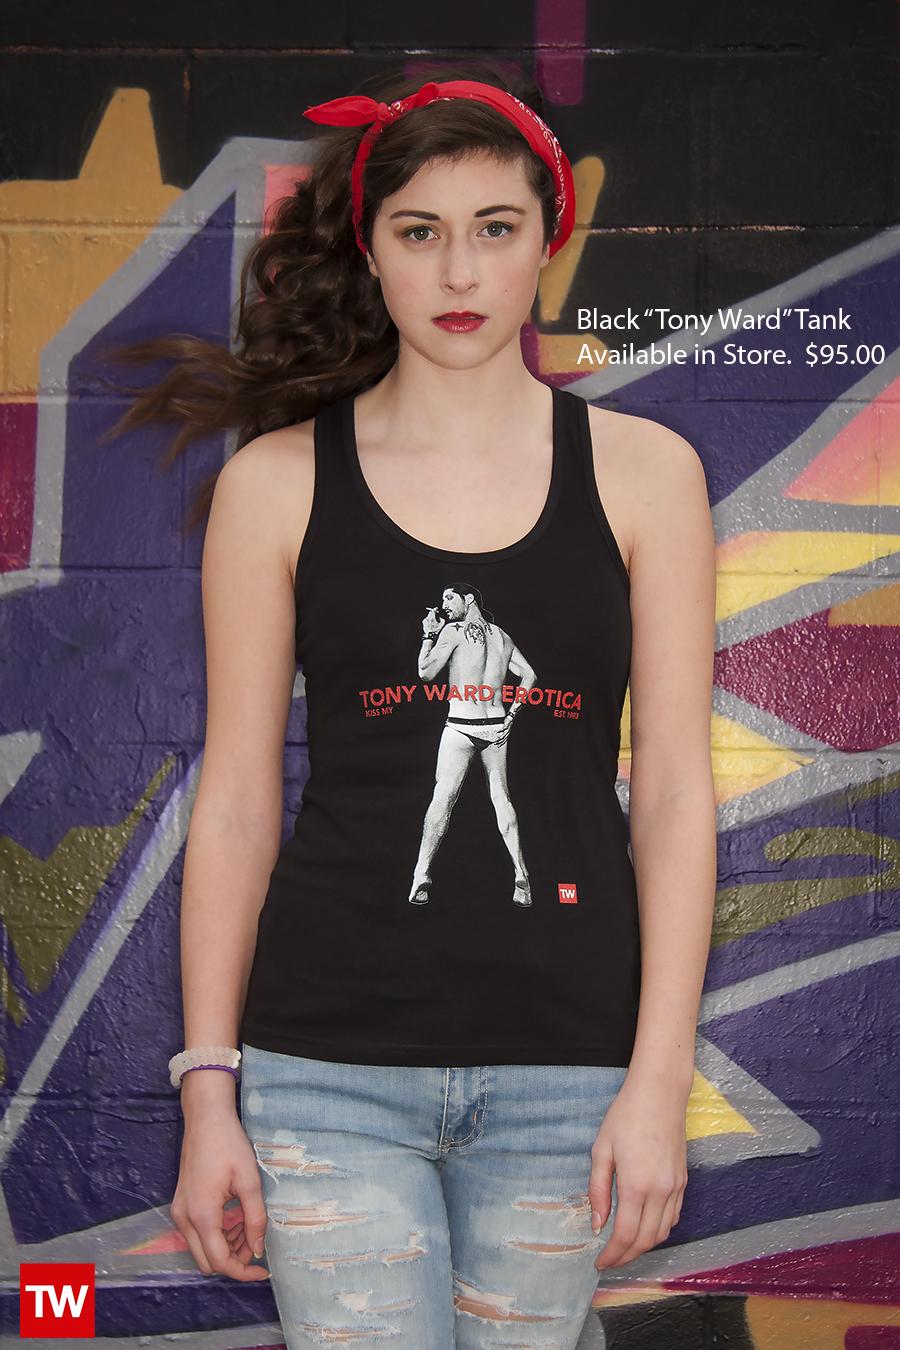 Tony_Ward_Studio_e_commerce_store_t-shirts_black_Kiss_My_tank_sale_model_Caralisa